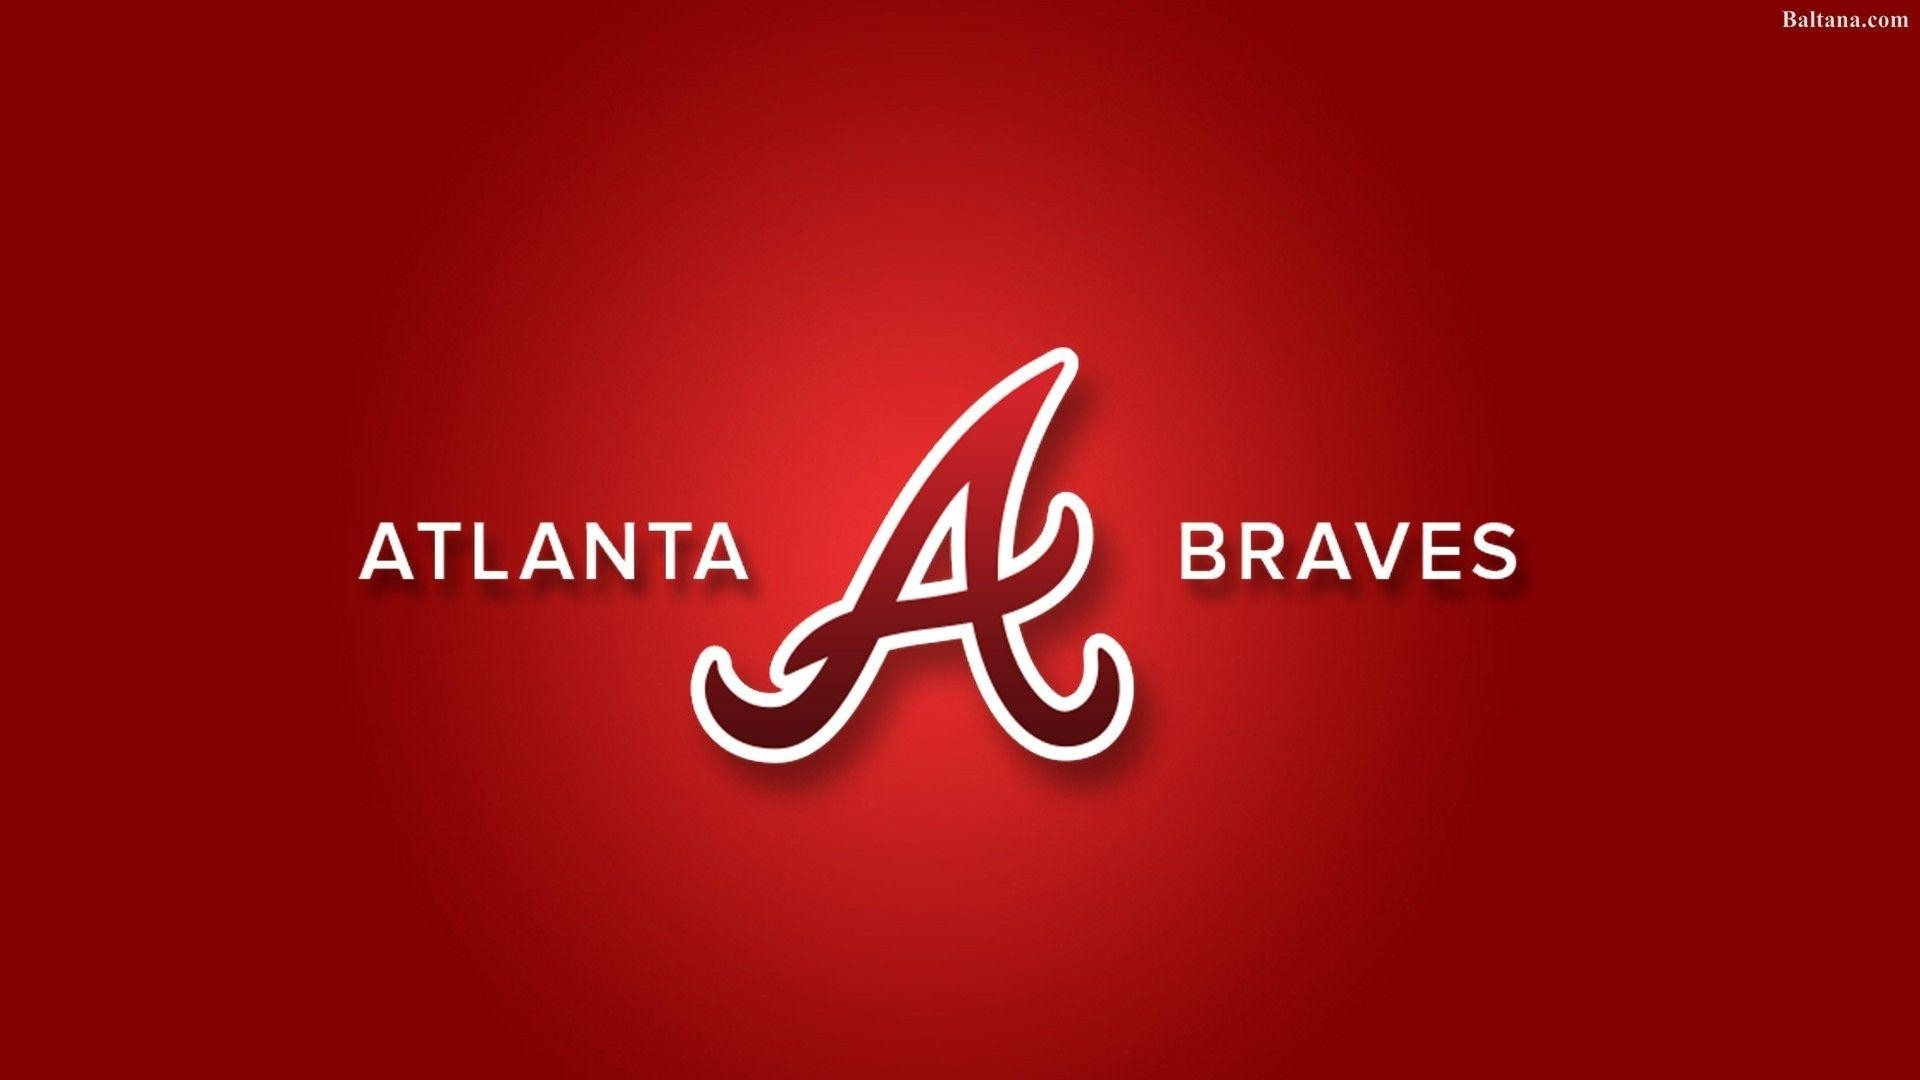 Atlanta Braves Wallpaper for pc